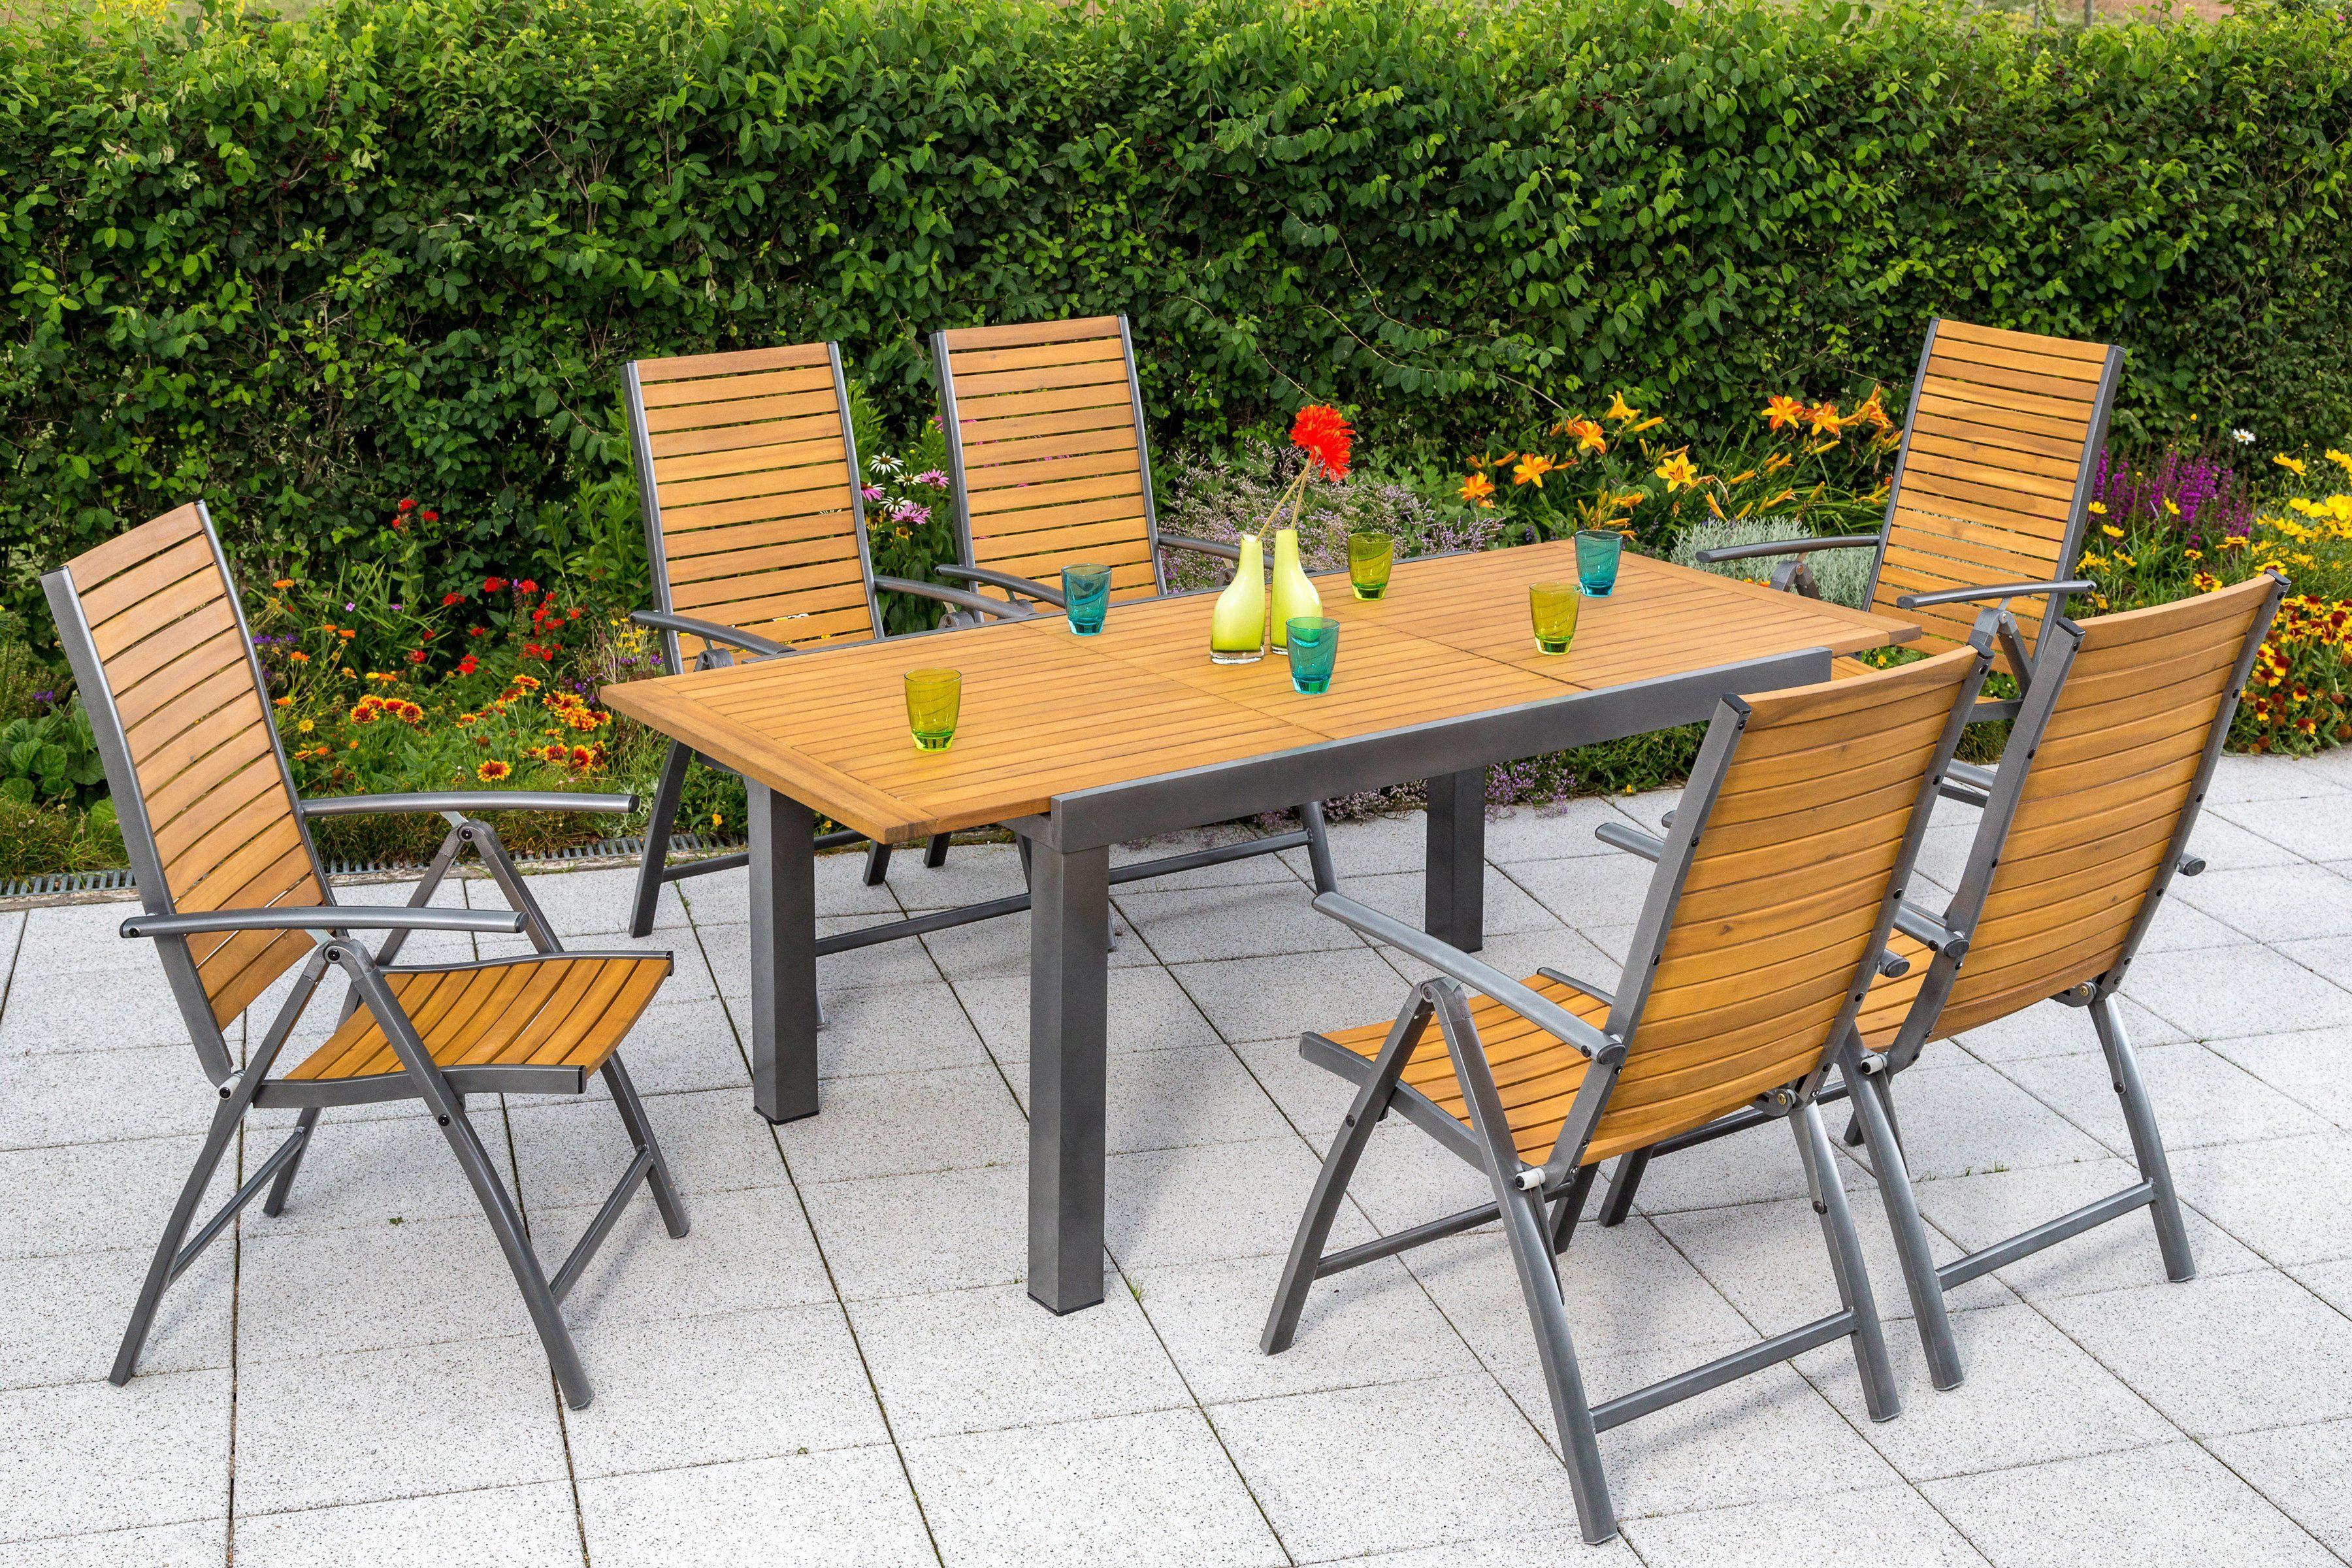 MERXX Gartenmöbelset »Santorin«, 7-tlg., 6 Klappsessel, Tisch 150-200 cm, Alu/Akazienholz